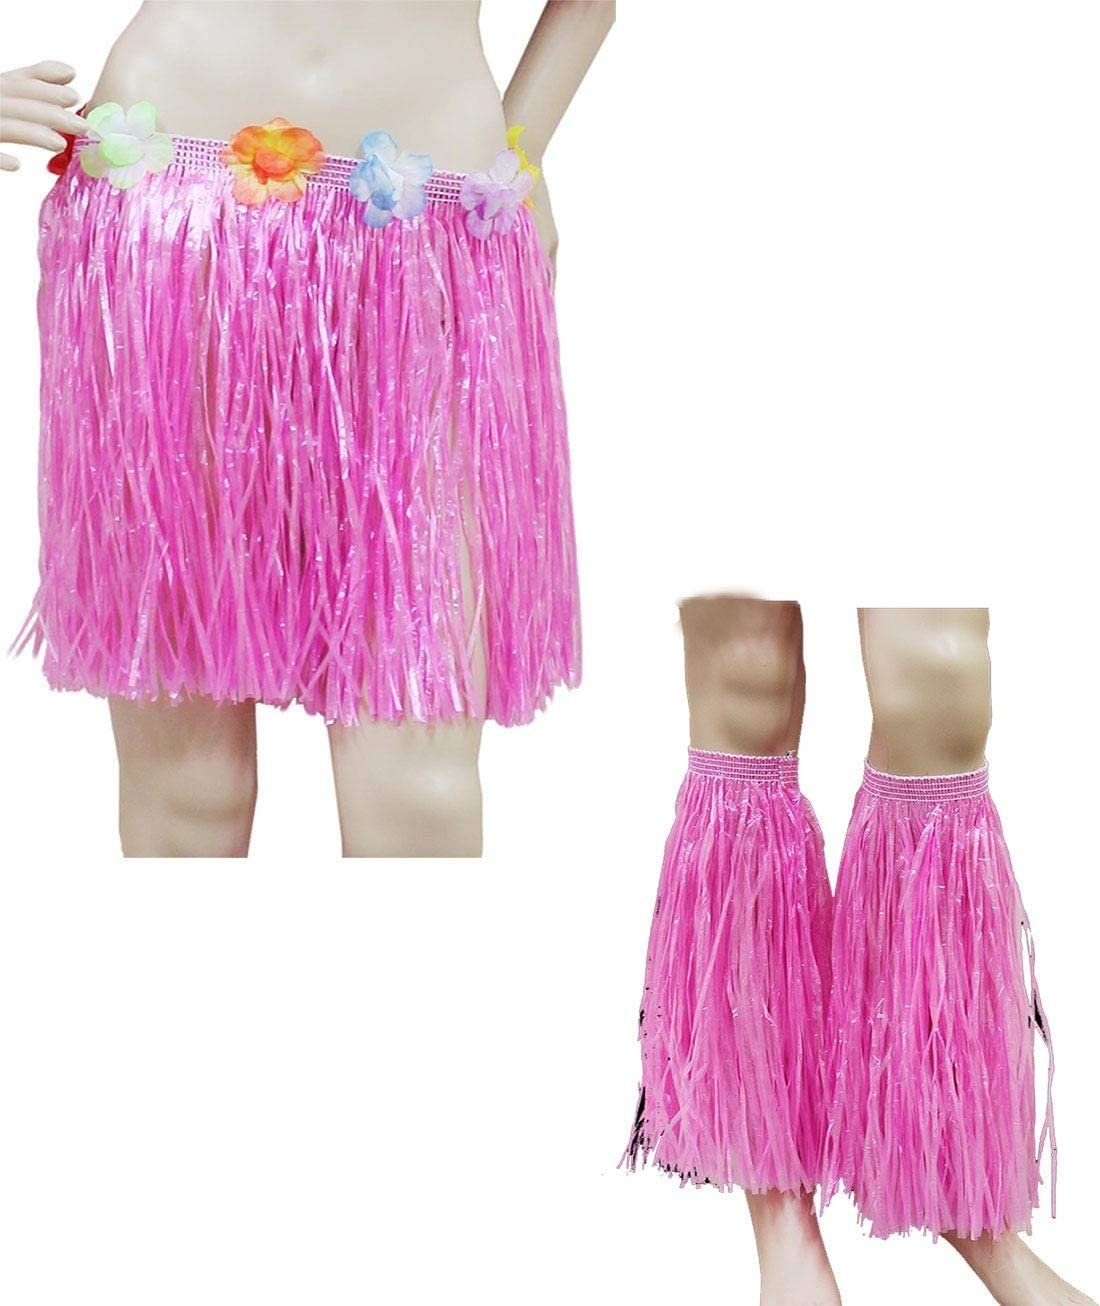 SHORT 40cm HAWAIIAN HULA SKIRT OR 4pc LEI SET LADIES LUAU FANCY DRESS COSTUME